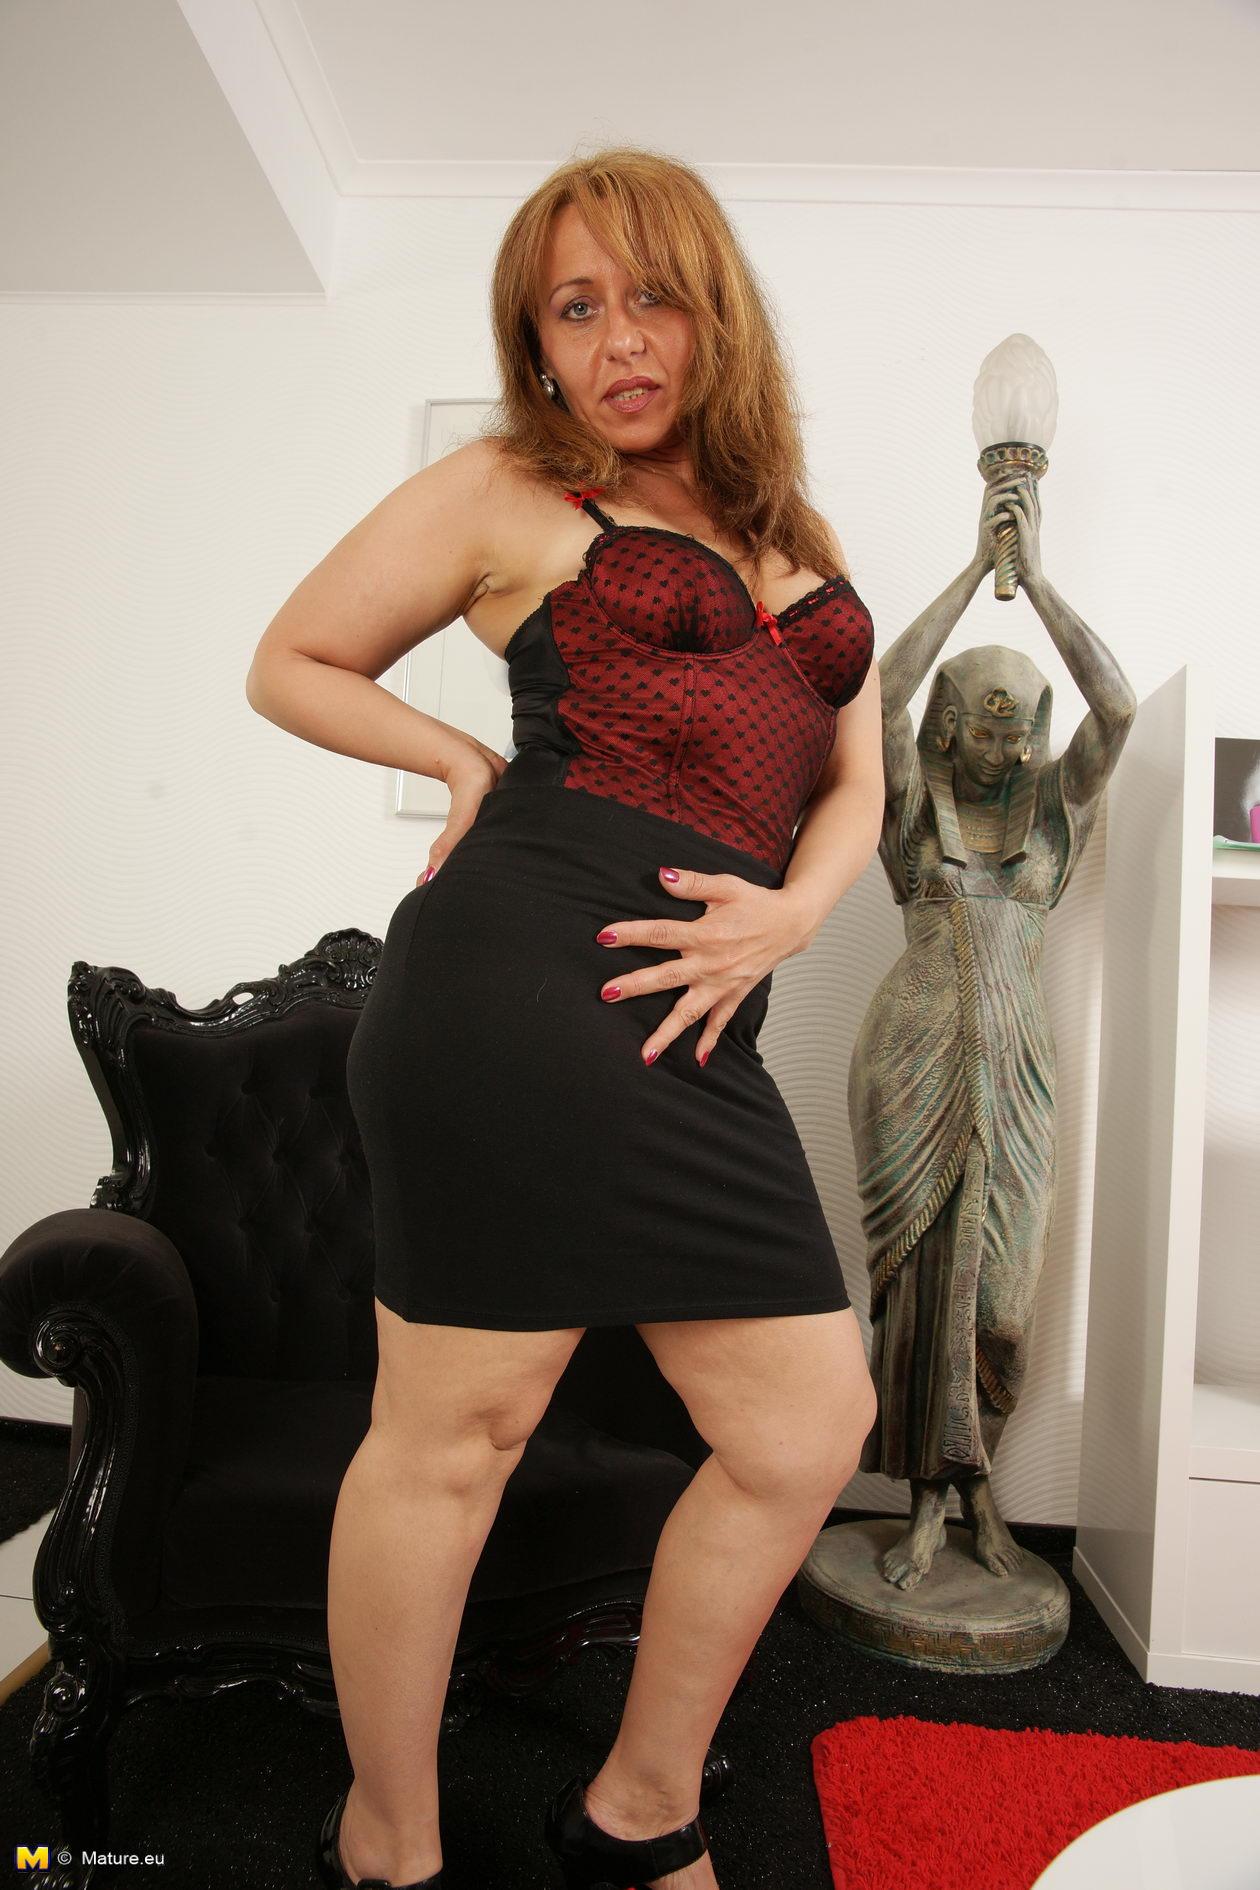 Hot British MILF showing off her bad side